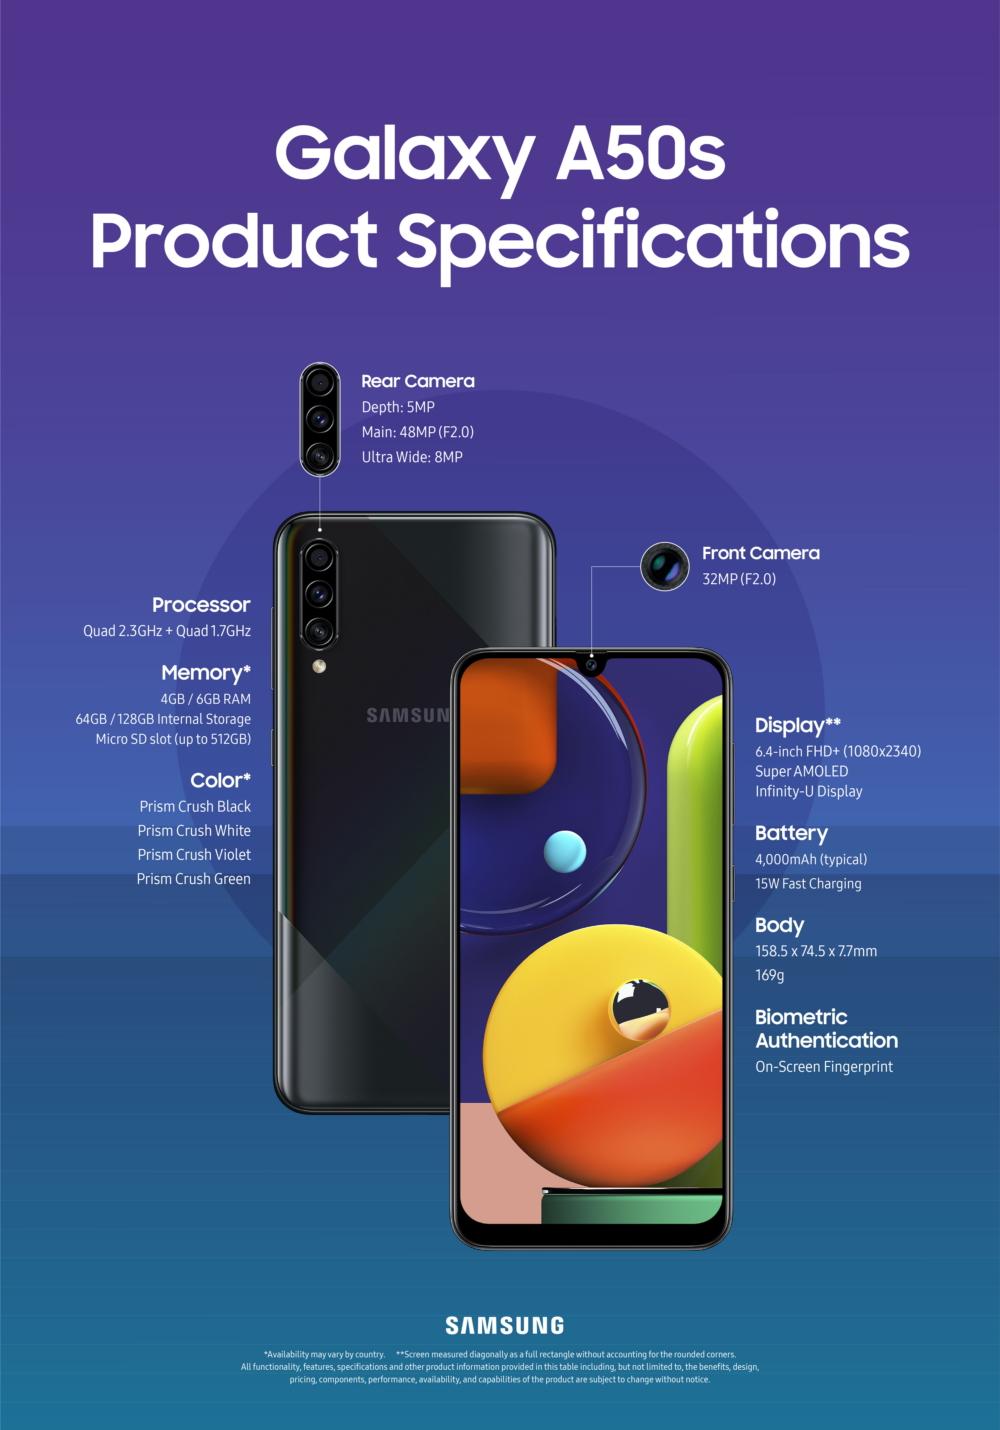 Samsung Galaxy A50s specs